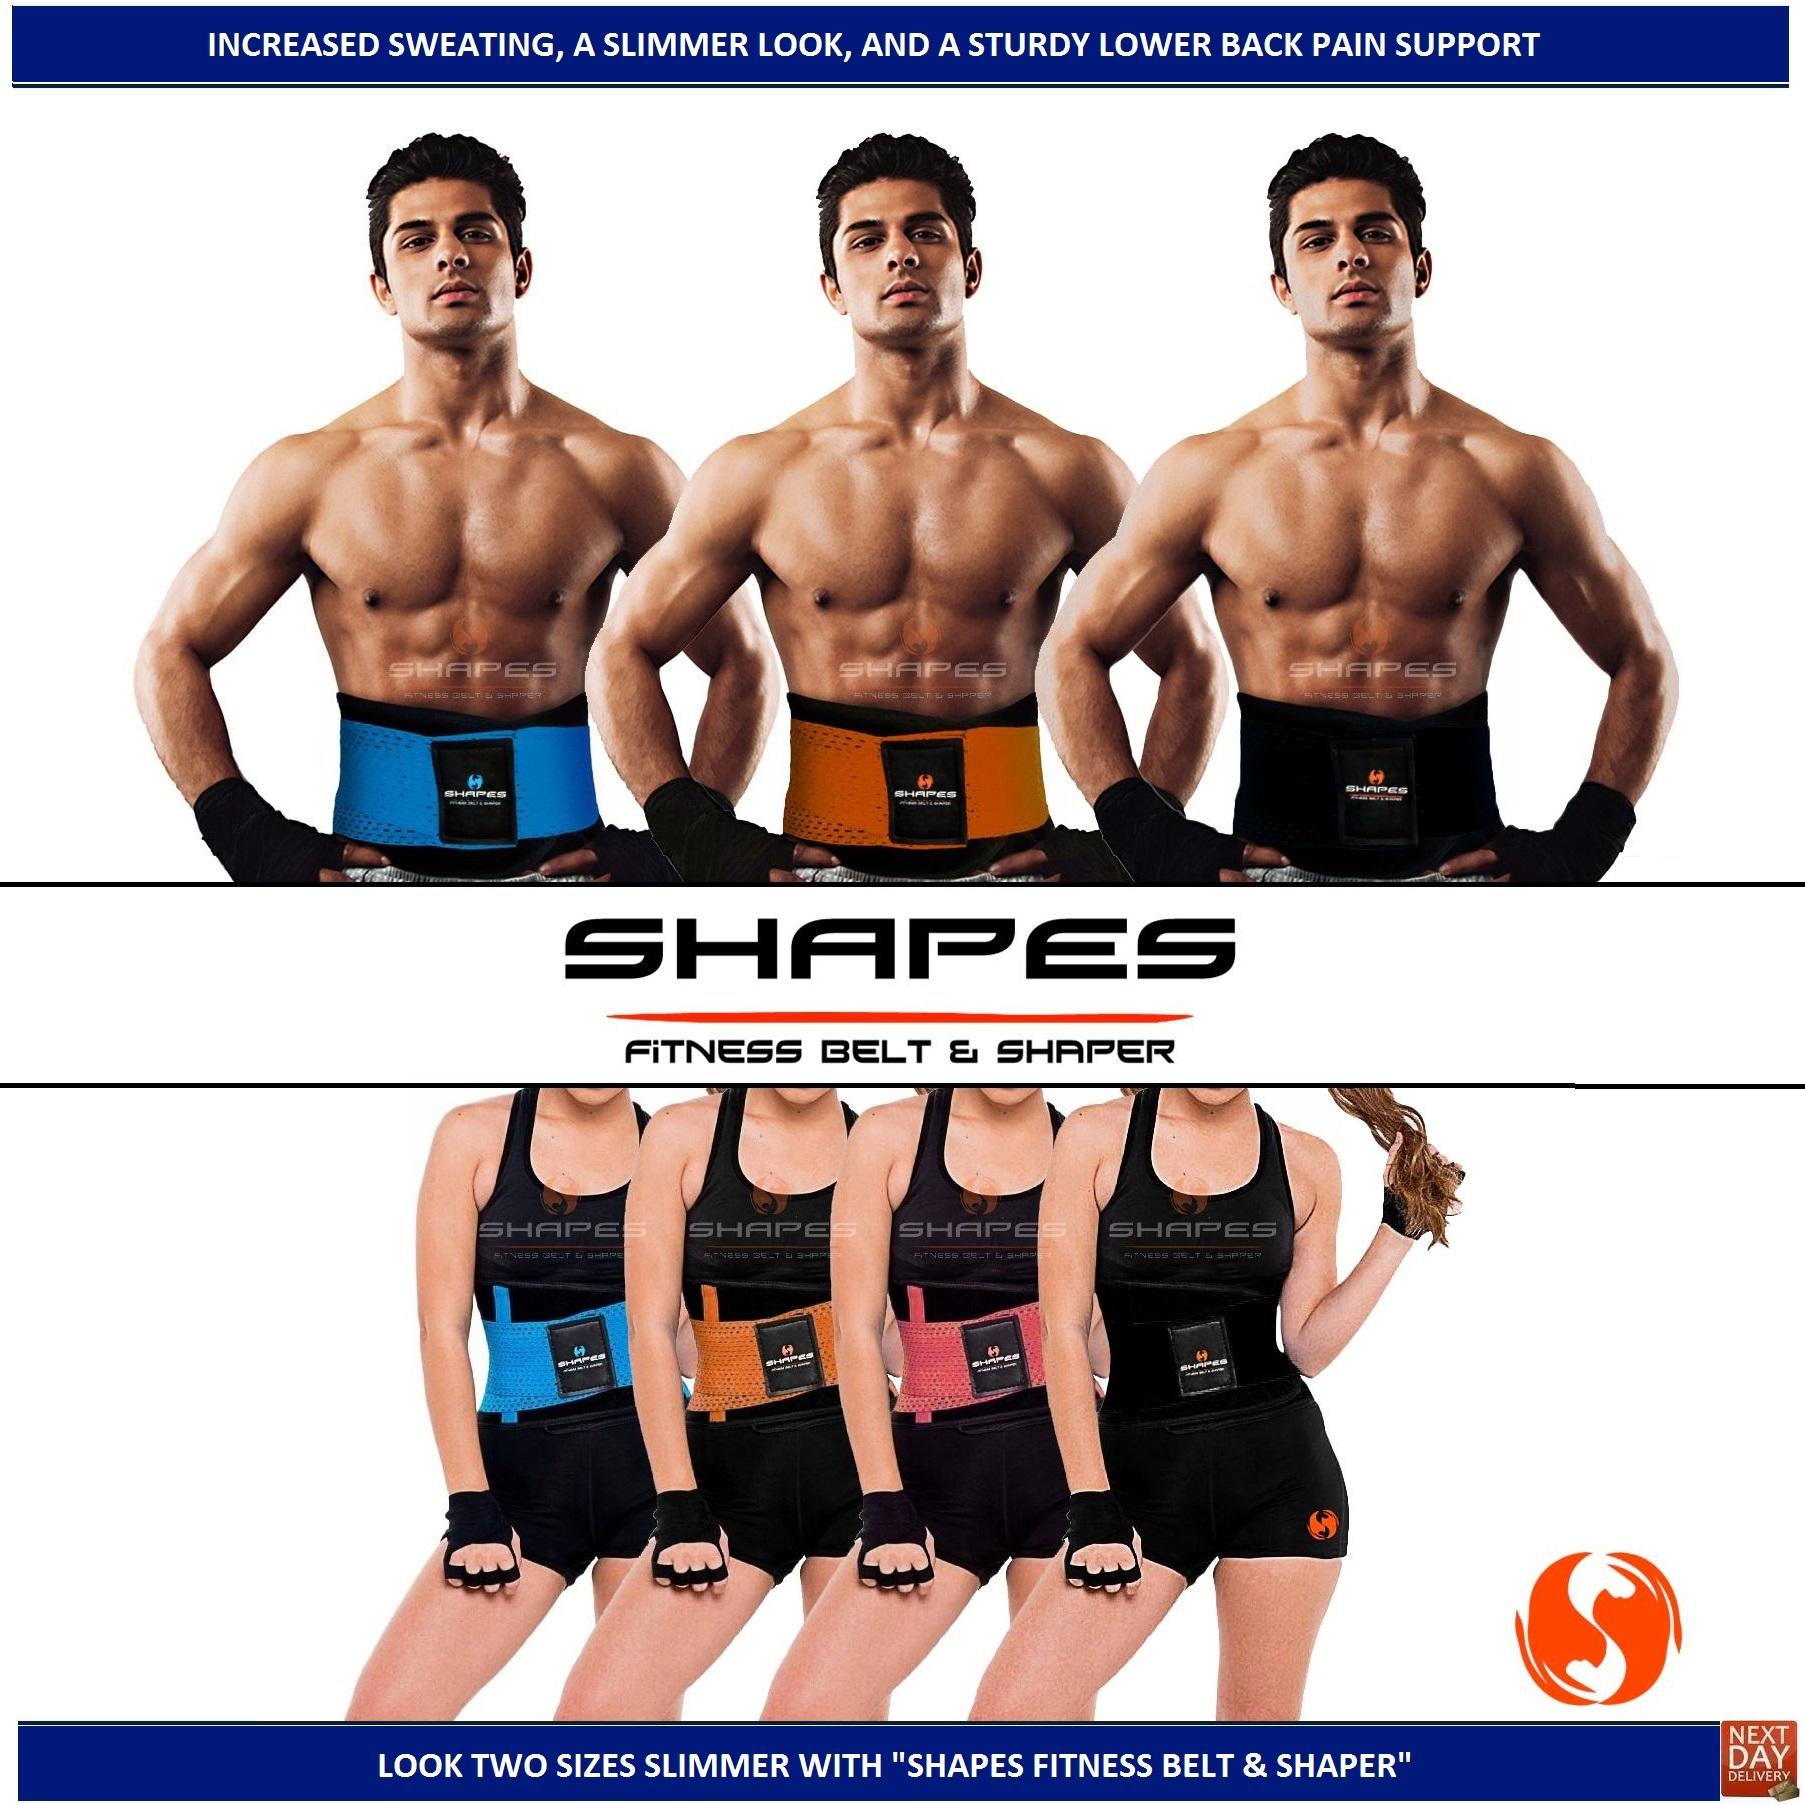 373bc1ec550 Details about Neoprene Lumbar Back Support Body Shaper Waist Cincher Trainer  Slimming Gym Belt